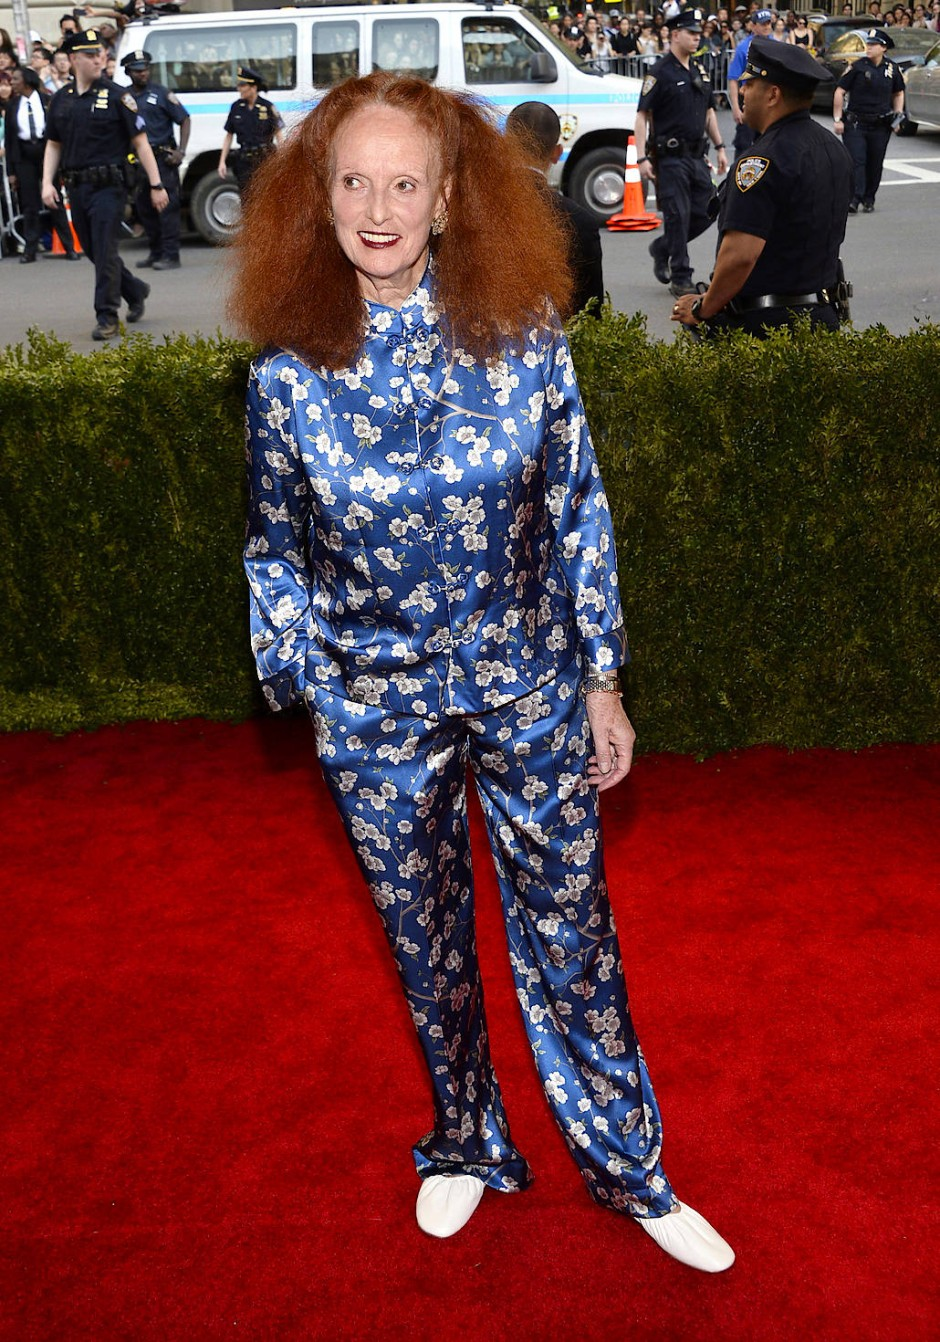 Grace Coddington kommt im Mai 2015 zur A. Wintour Costume Center Gala im New Yorker Metropolitan Museum of Art.